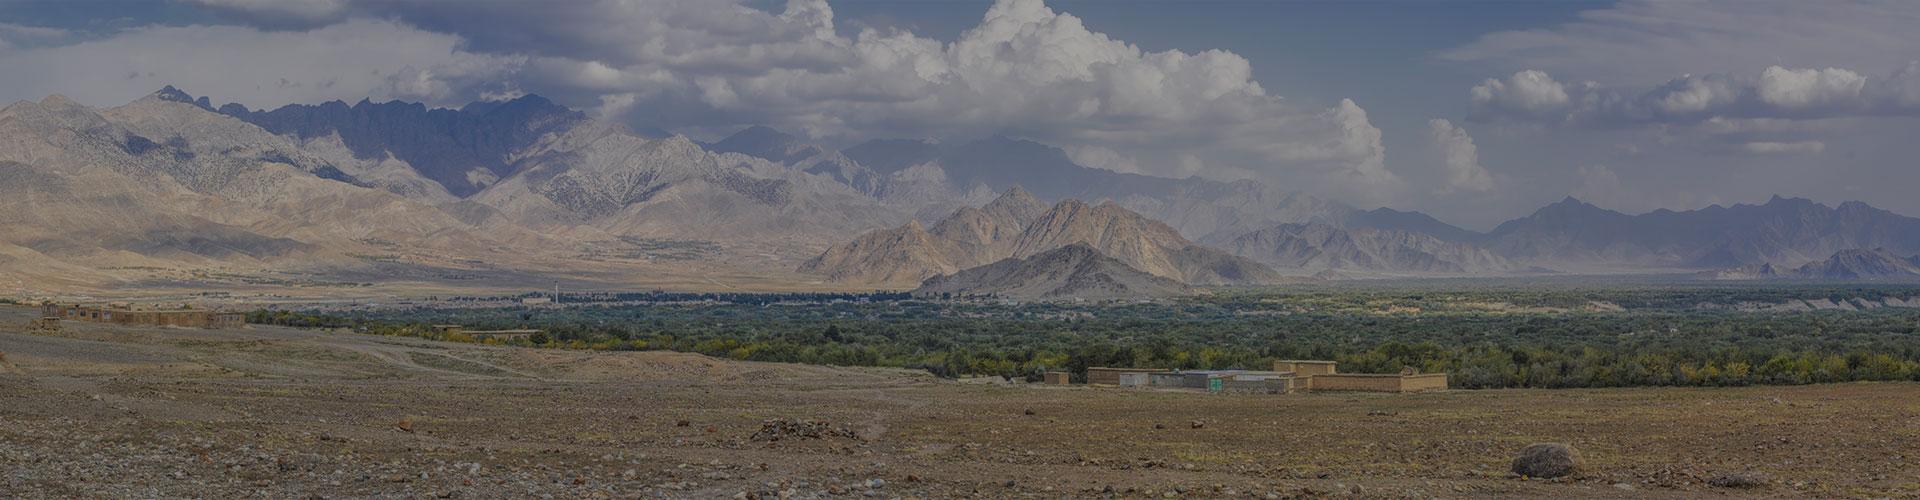 Landmark photograph of Afghanistan